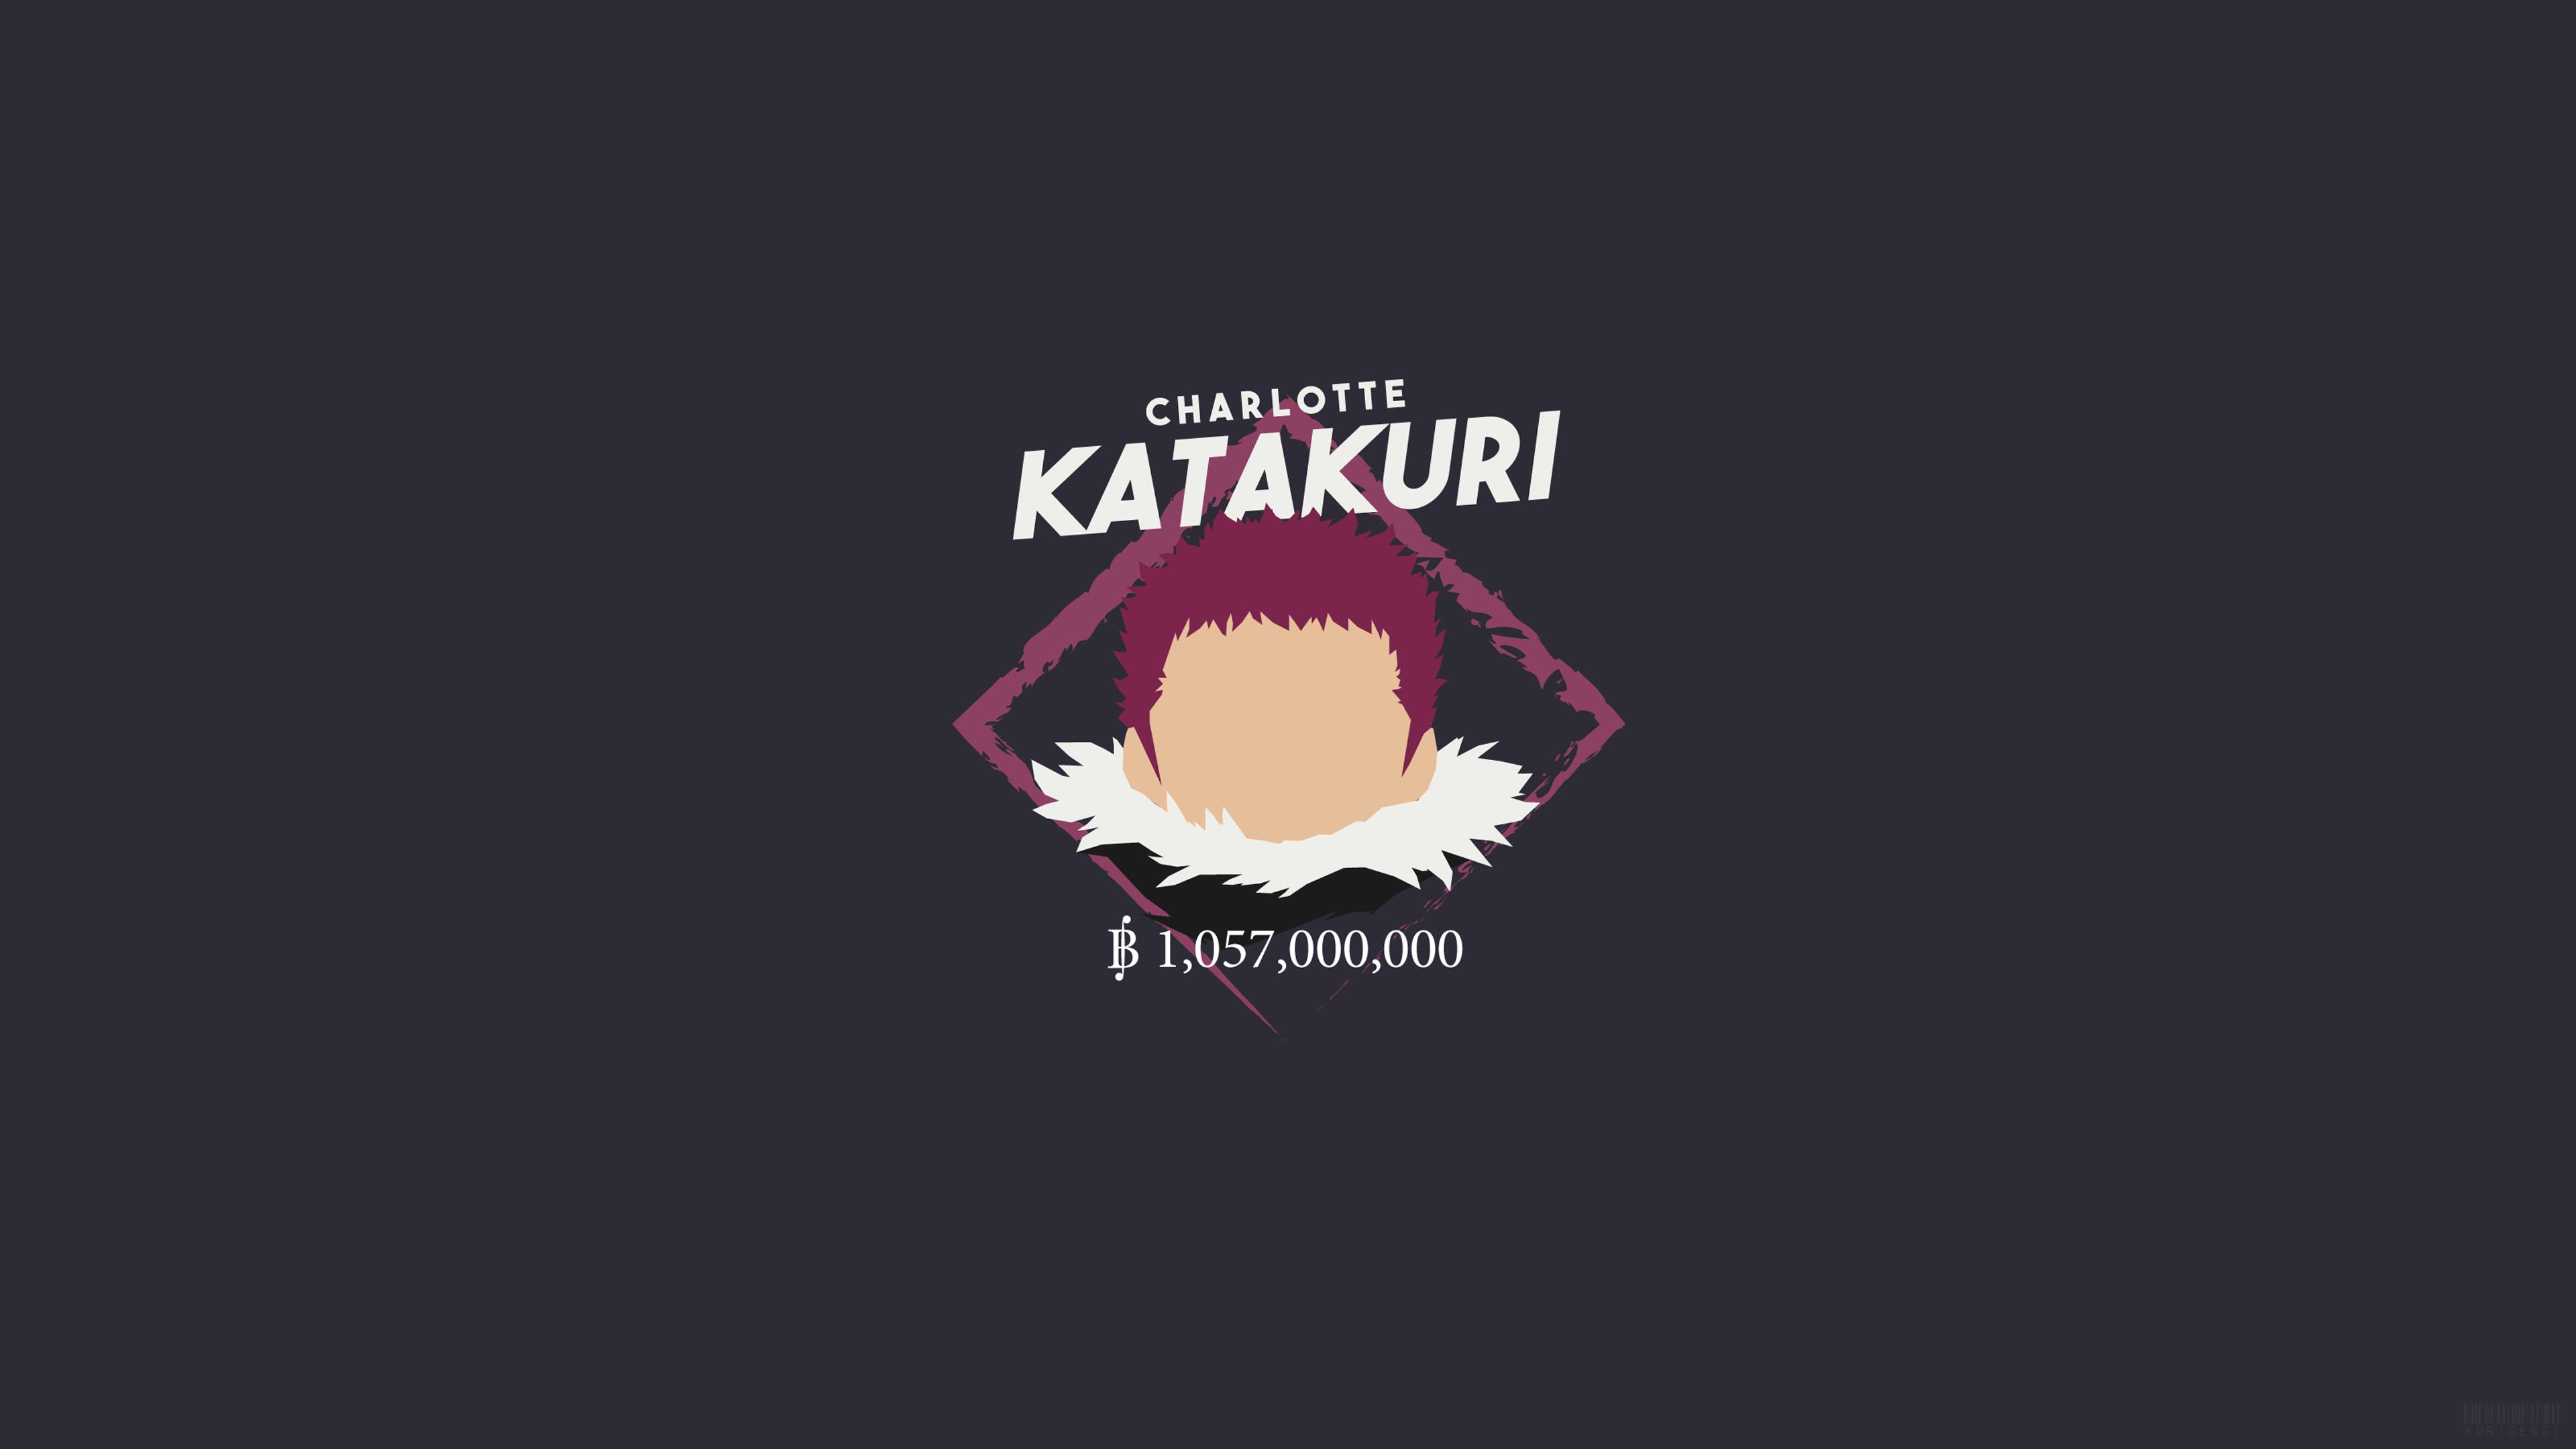 Cahrlotte Katakuri One Piece Wallpaper Smartphone Desktop Os